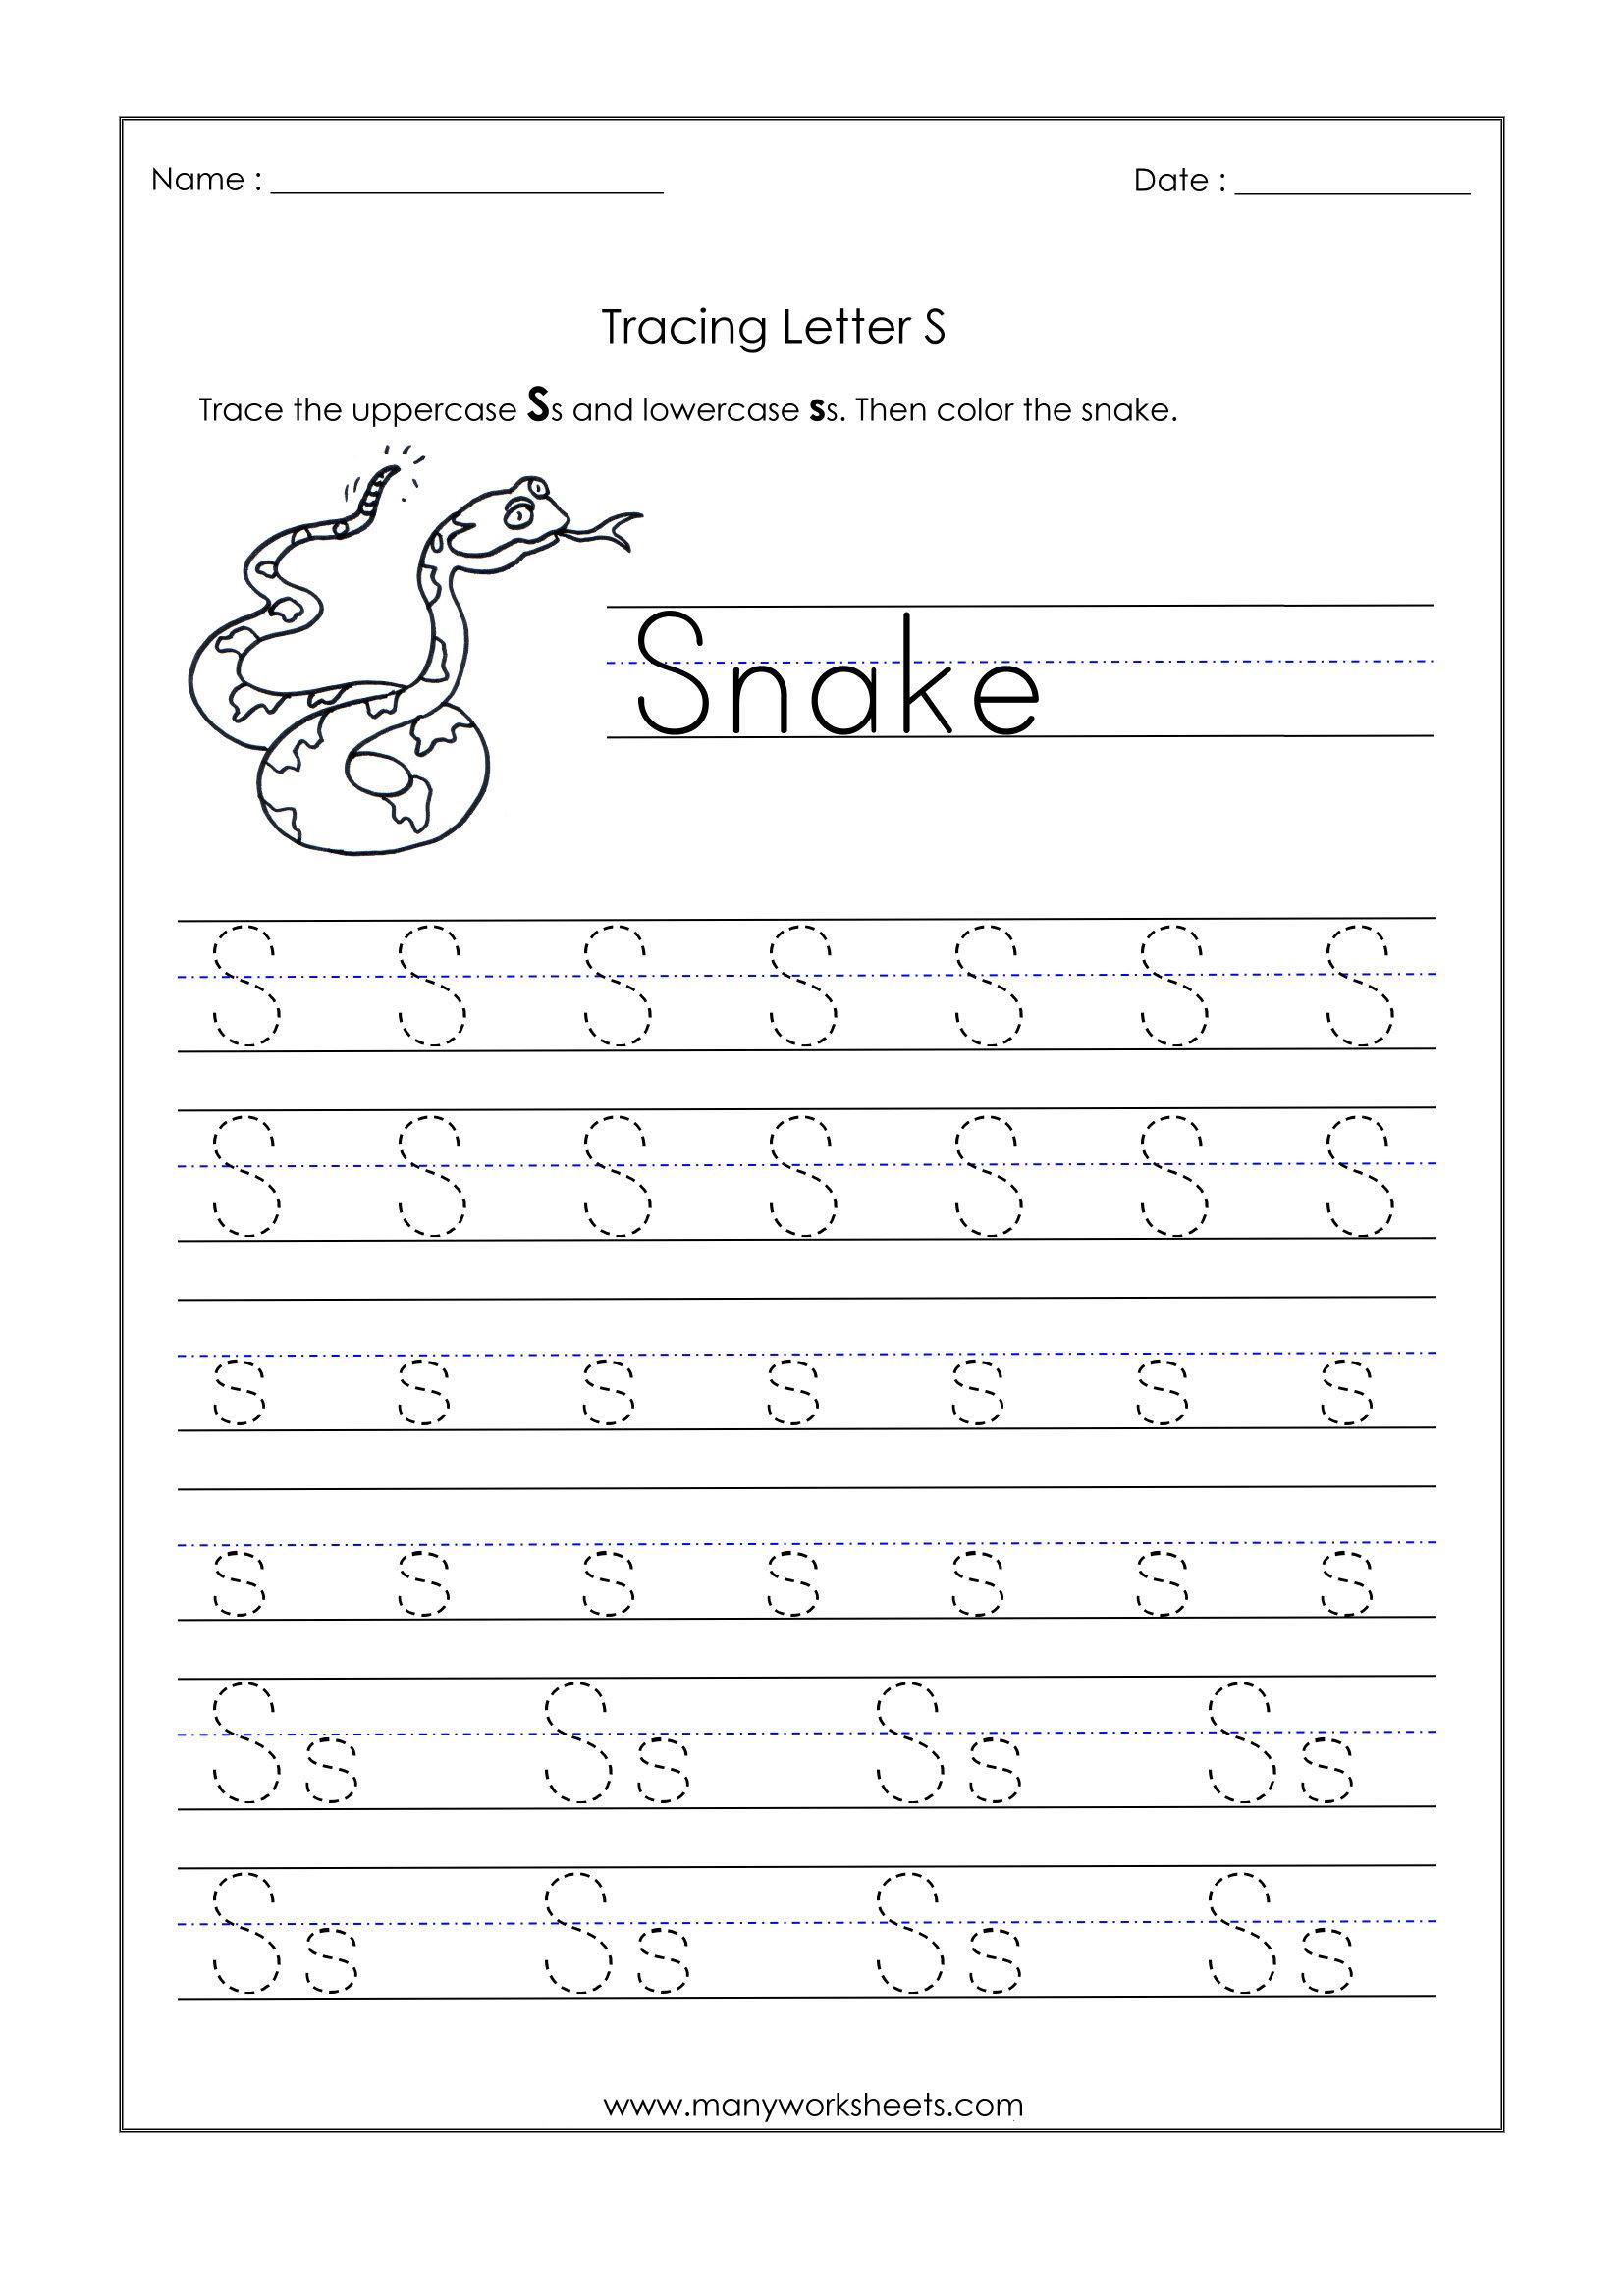 Letter S Worksheets For Kindergarten – Trace Dotted Letters regarding Alphabet Tracing Worksheets S